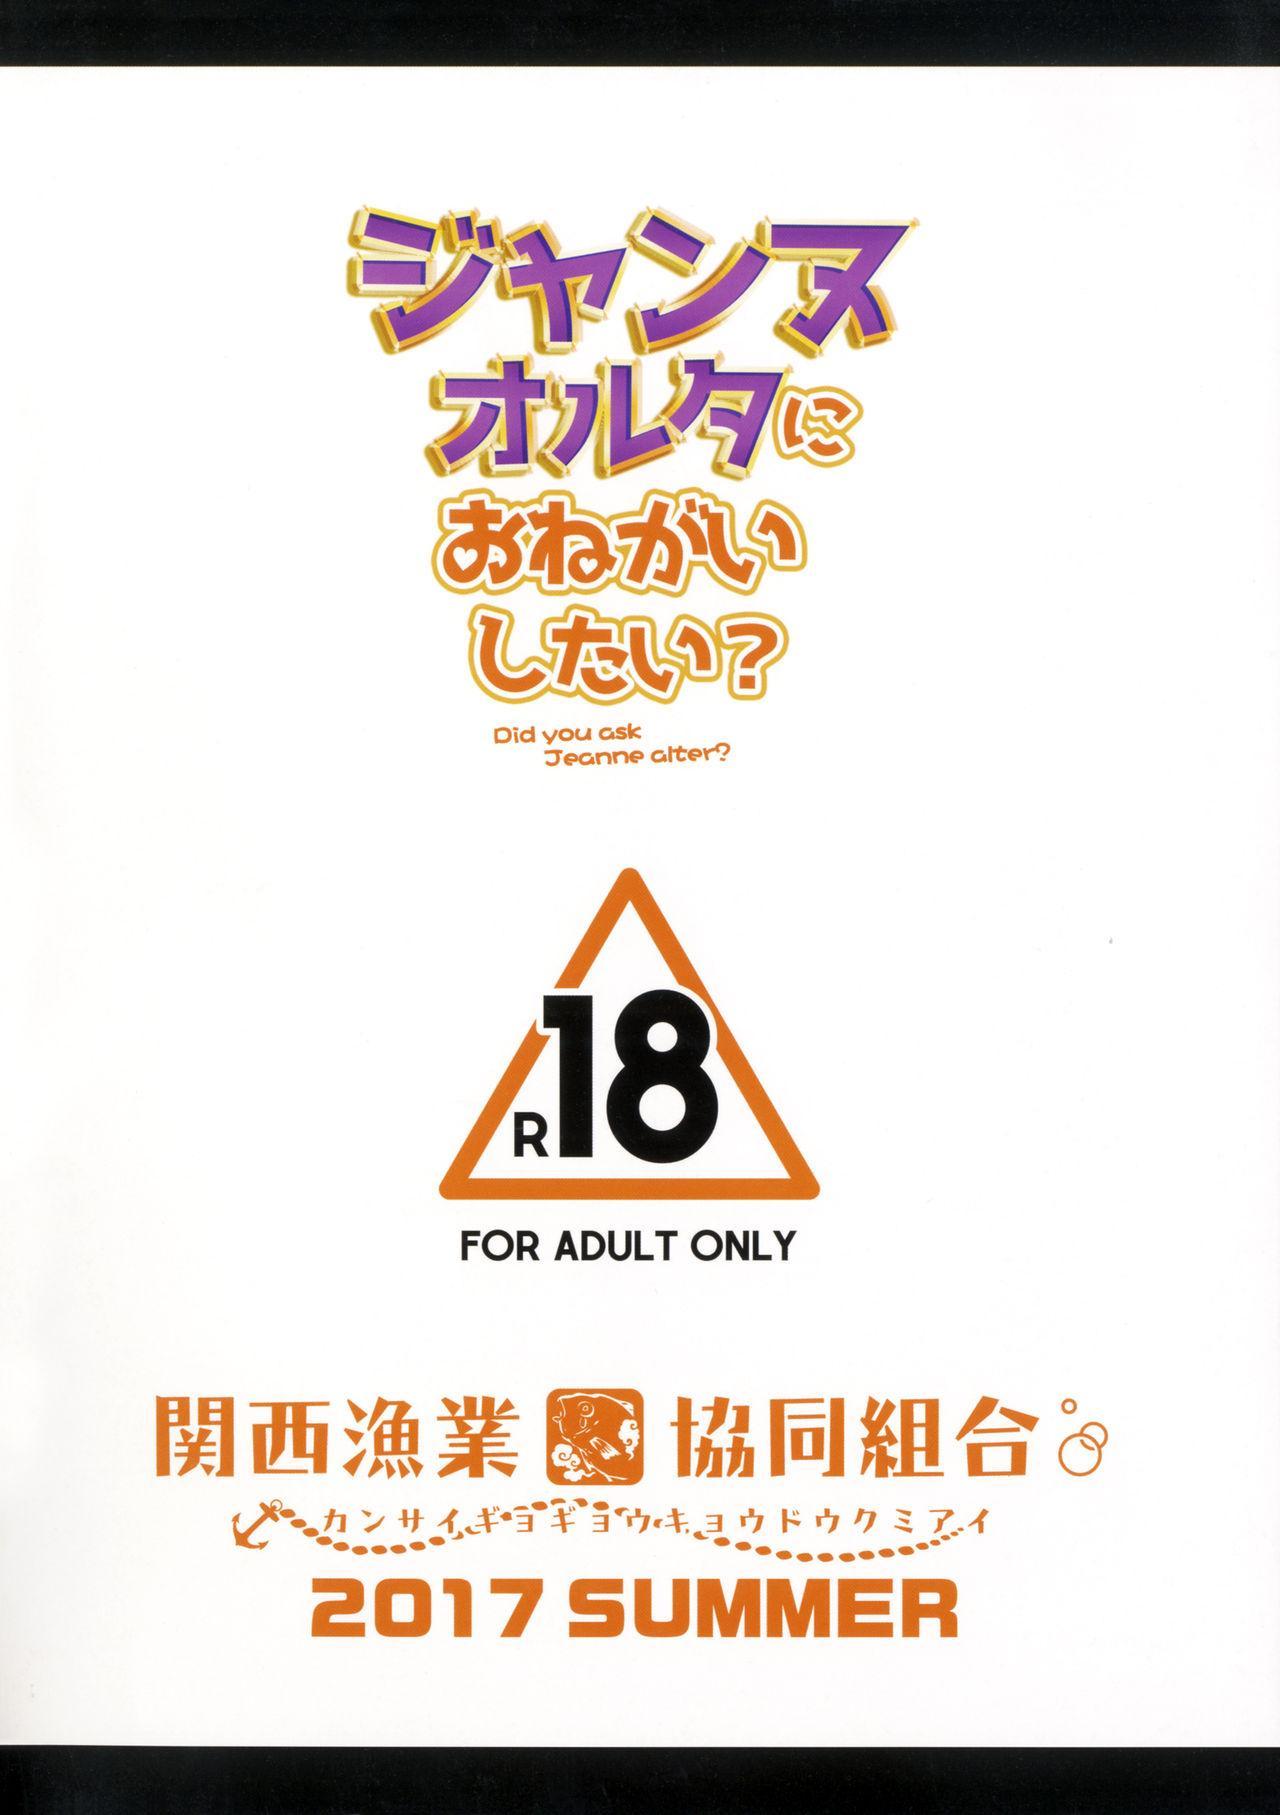 Jeanne Alter ni Onegai Shitai? + Omake Shikishi | Did you ask Jeanne alter? + Bonus Color Page 19